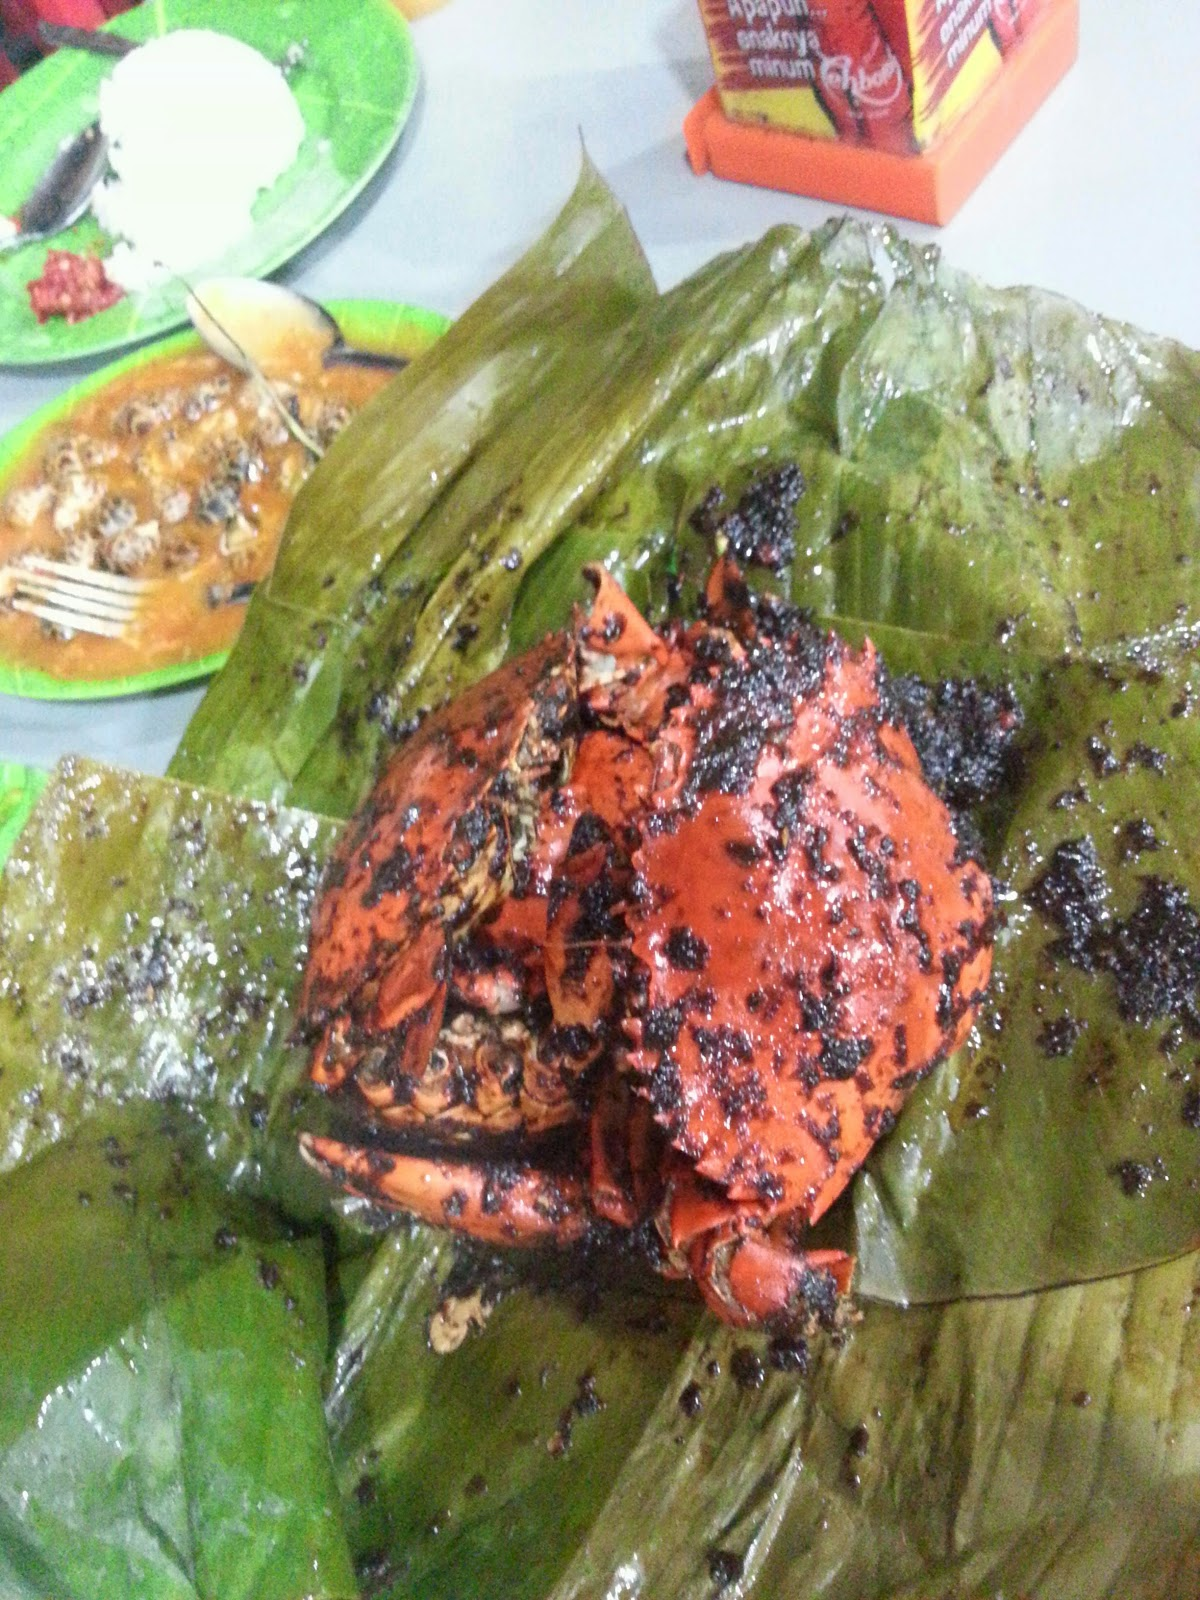 onetwotreat: Acui Bola Seafood, Pantai Indah Kapuk Jakarta